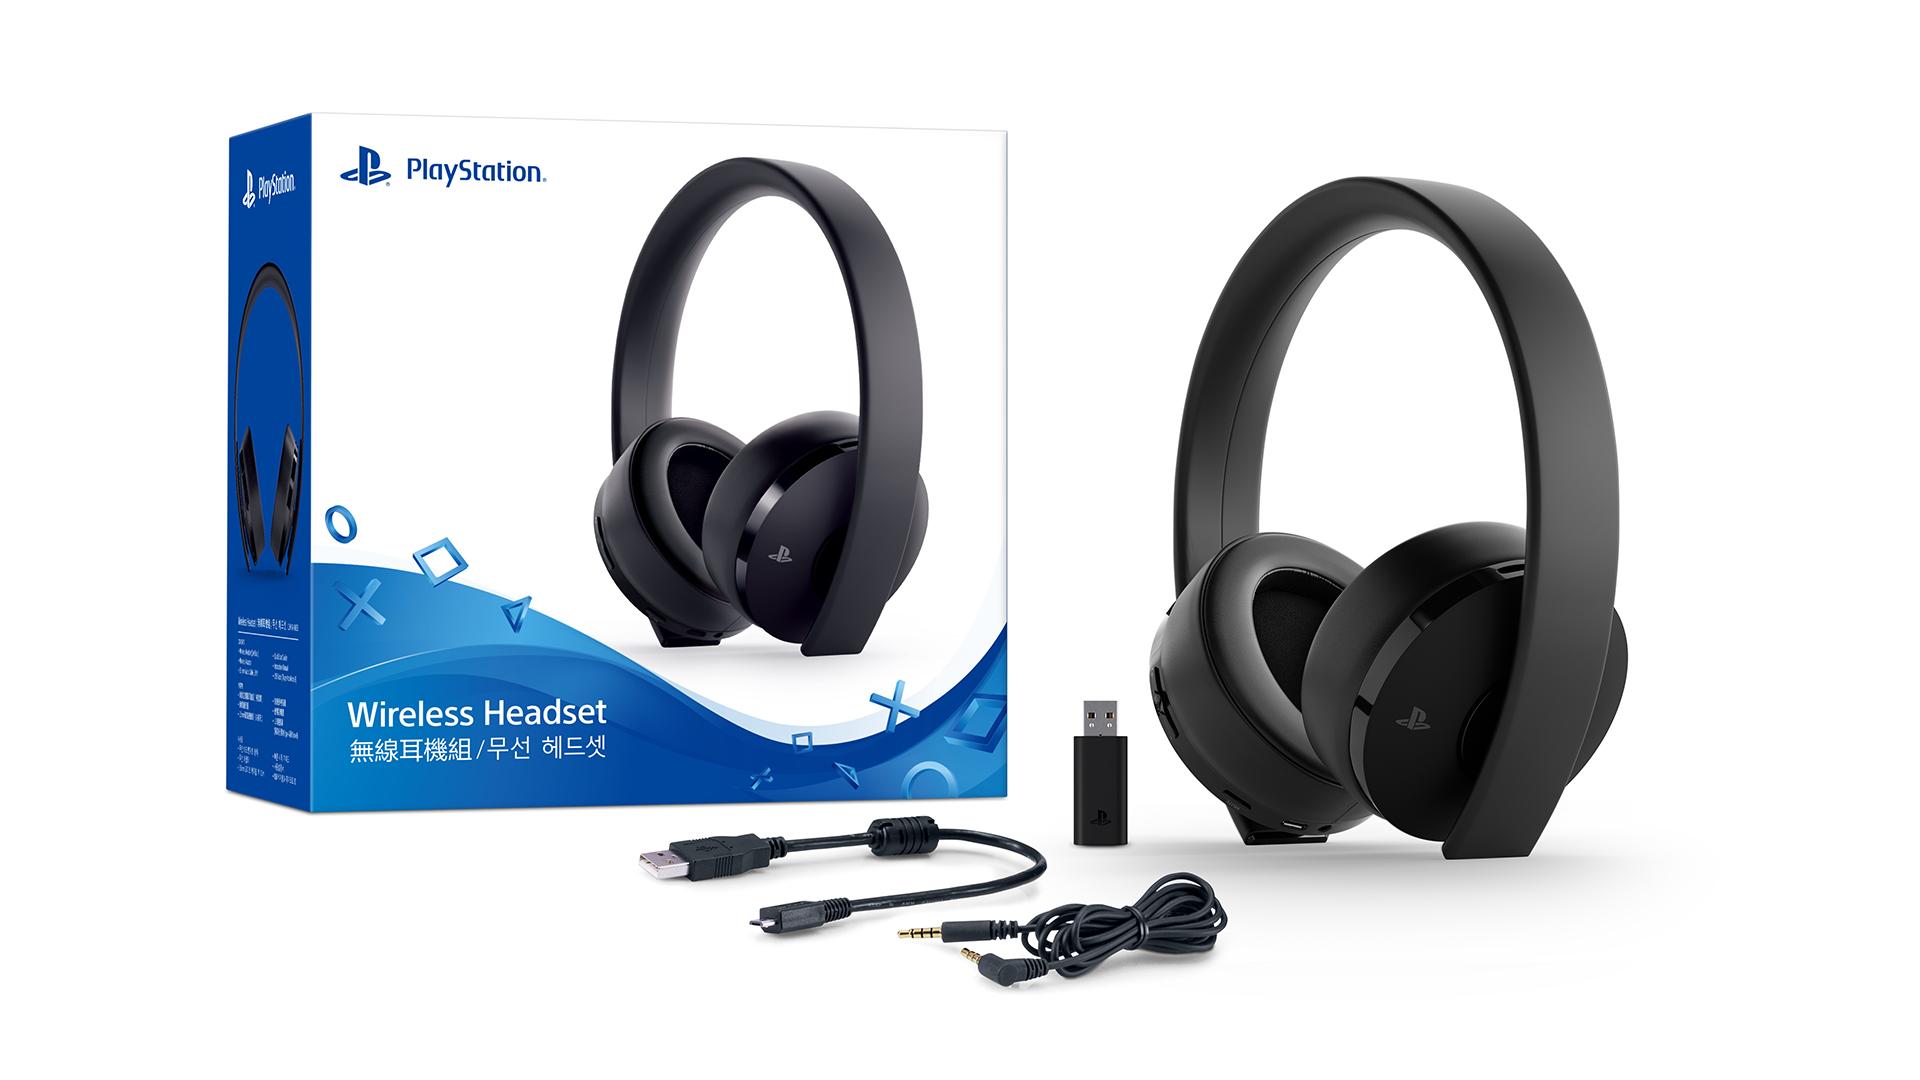 gold wireless headset april 2018